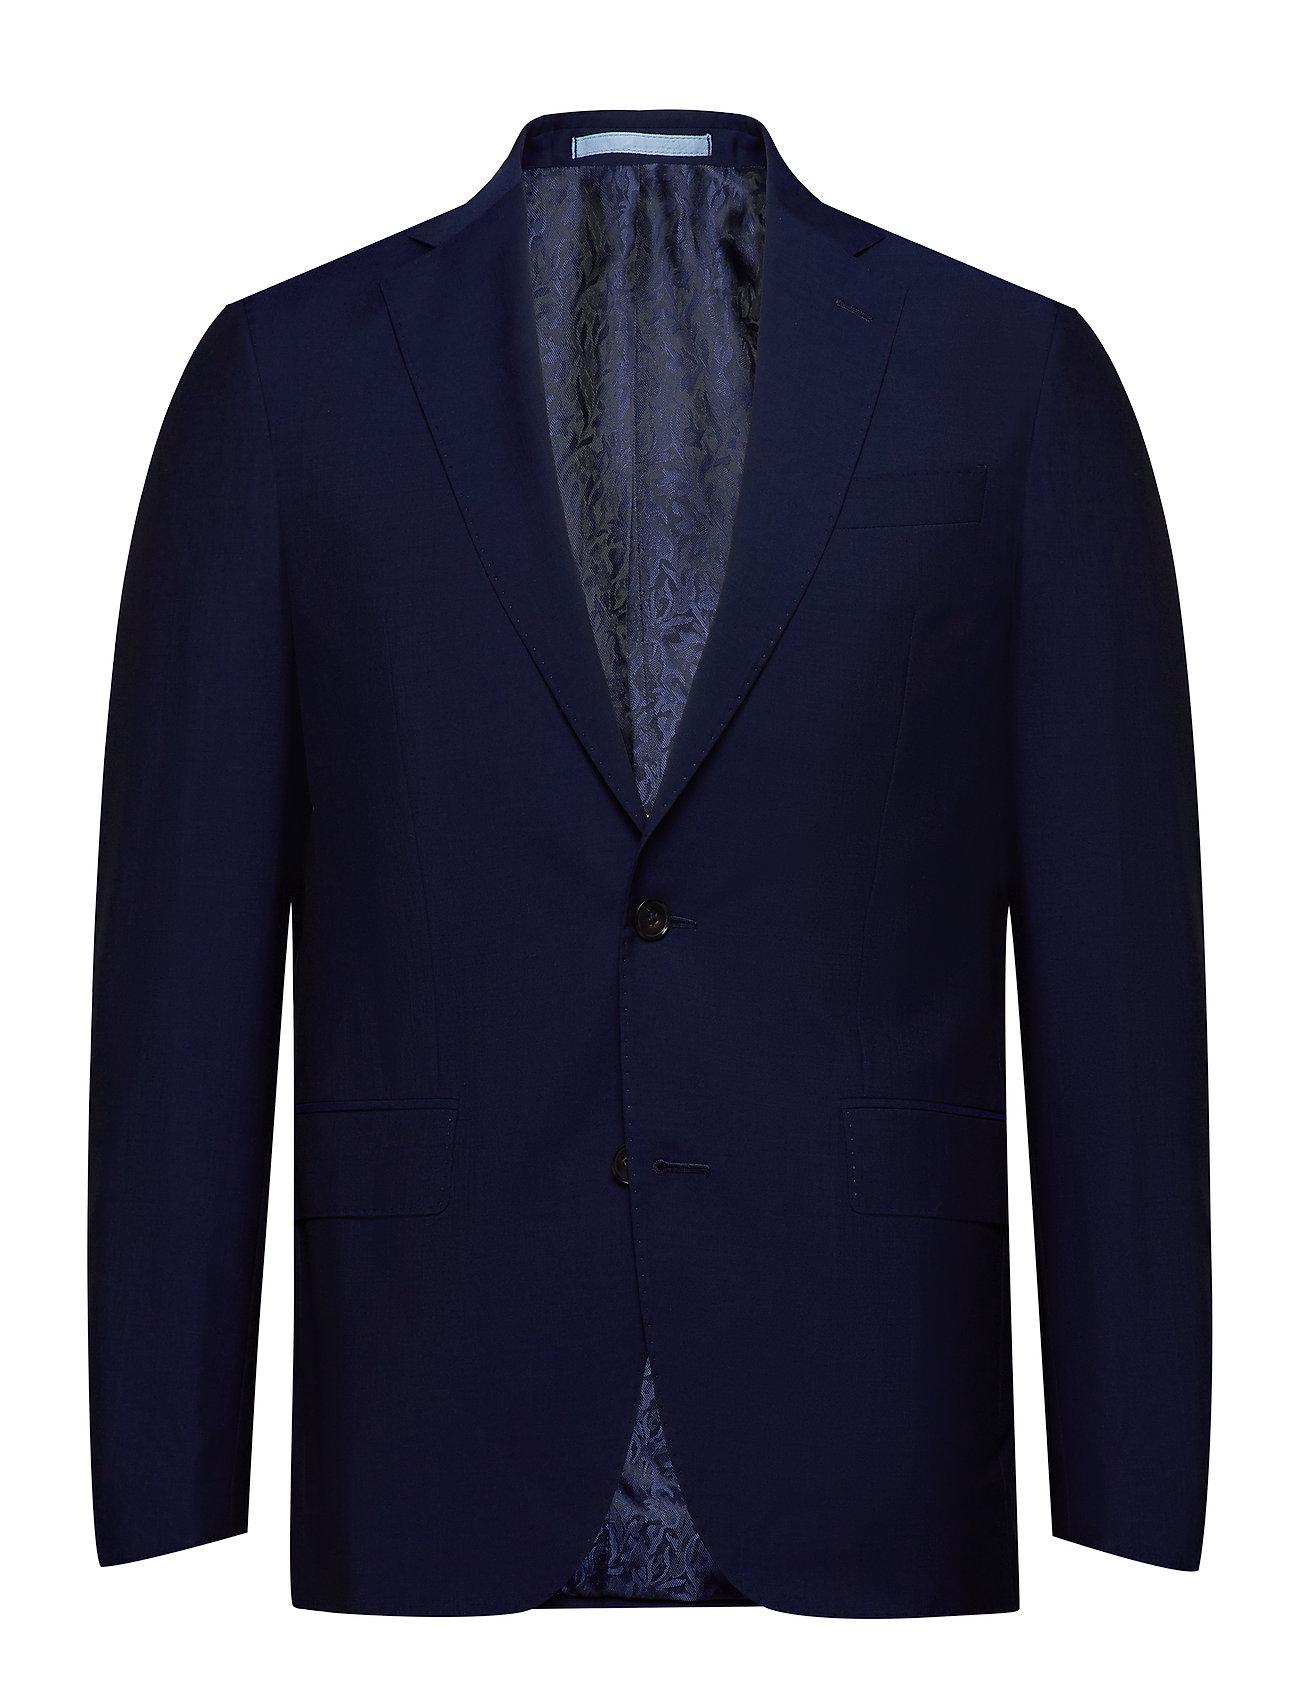 SAND Mohair Star Napoli Normal Kostymer & kavajer